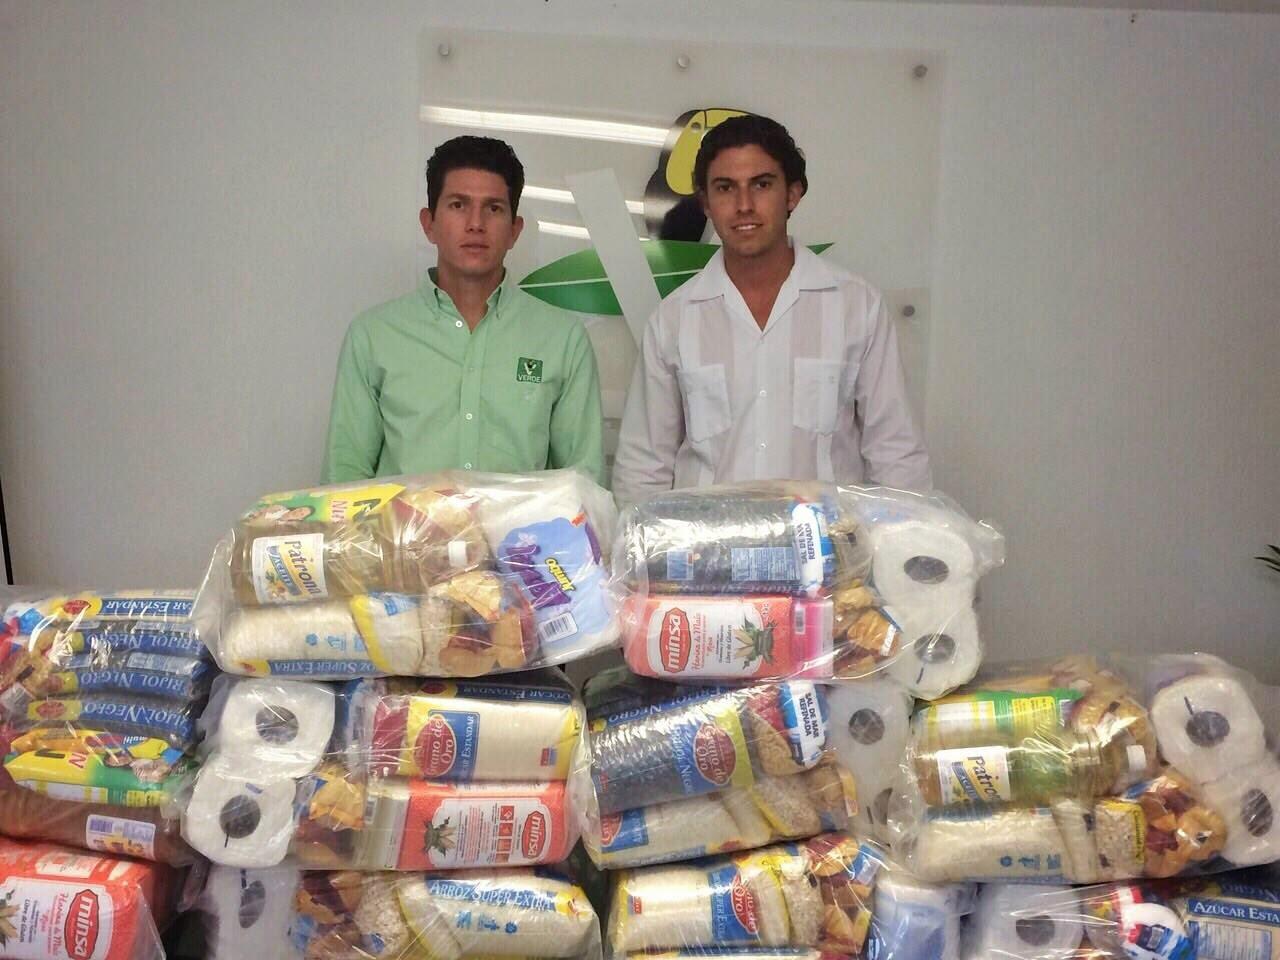 LE SALIÓ BARATA LA 'TRANSA': Multa TEPJF a Remberto Estrada con $70 mil por repartir despensas en Cancún, pero conservará diputación federal